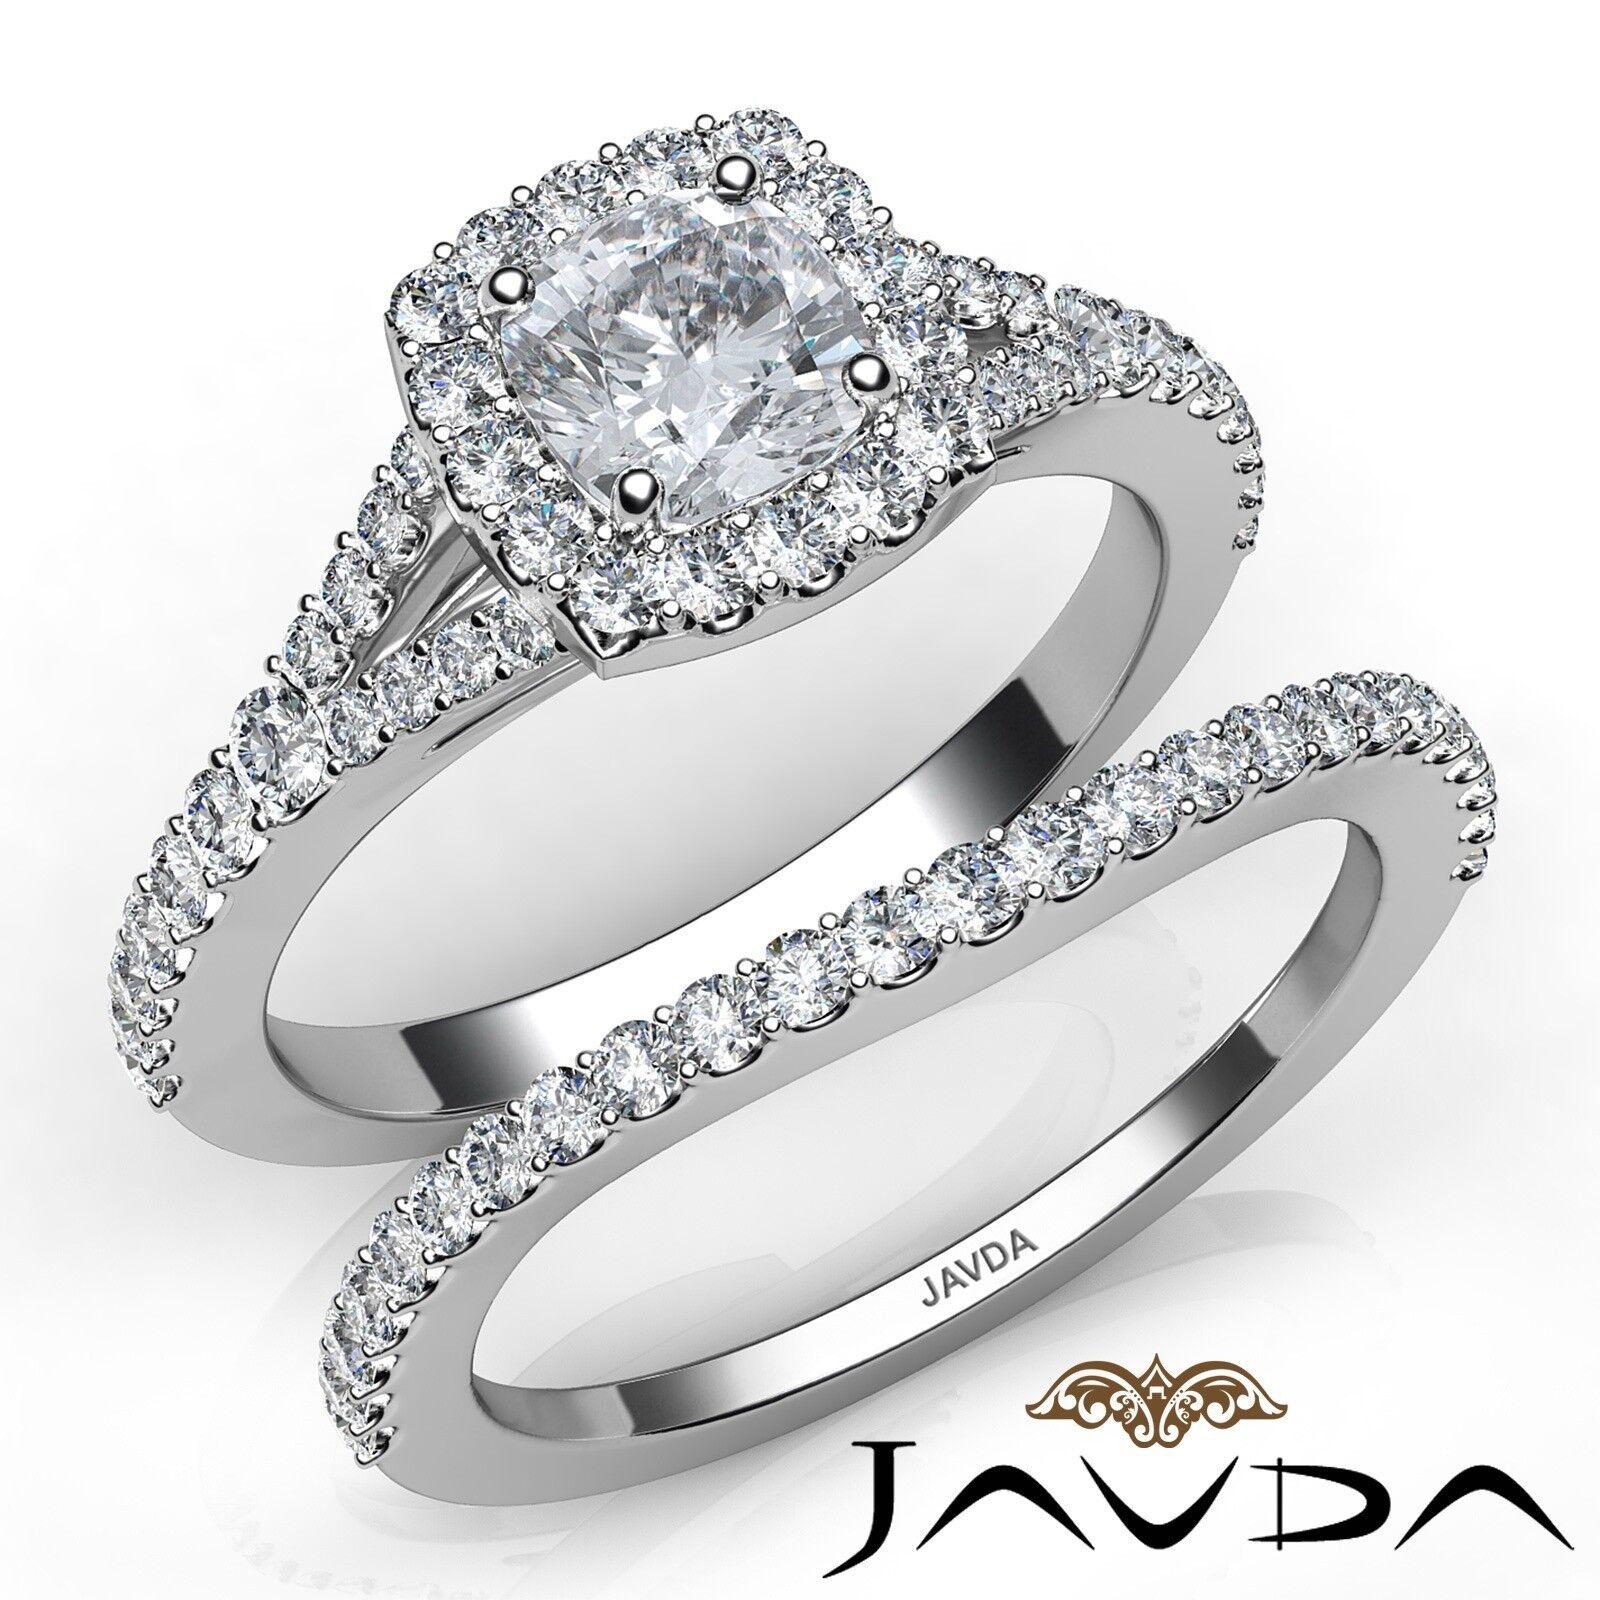 1.5ctw U Cut Pave Halo Bridal Cushion Diamond Engagement Ring GIA F-VS2 W Gold